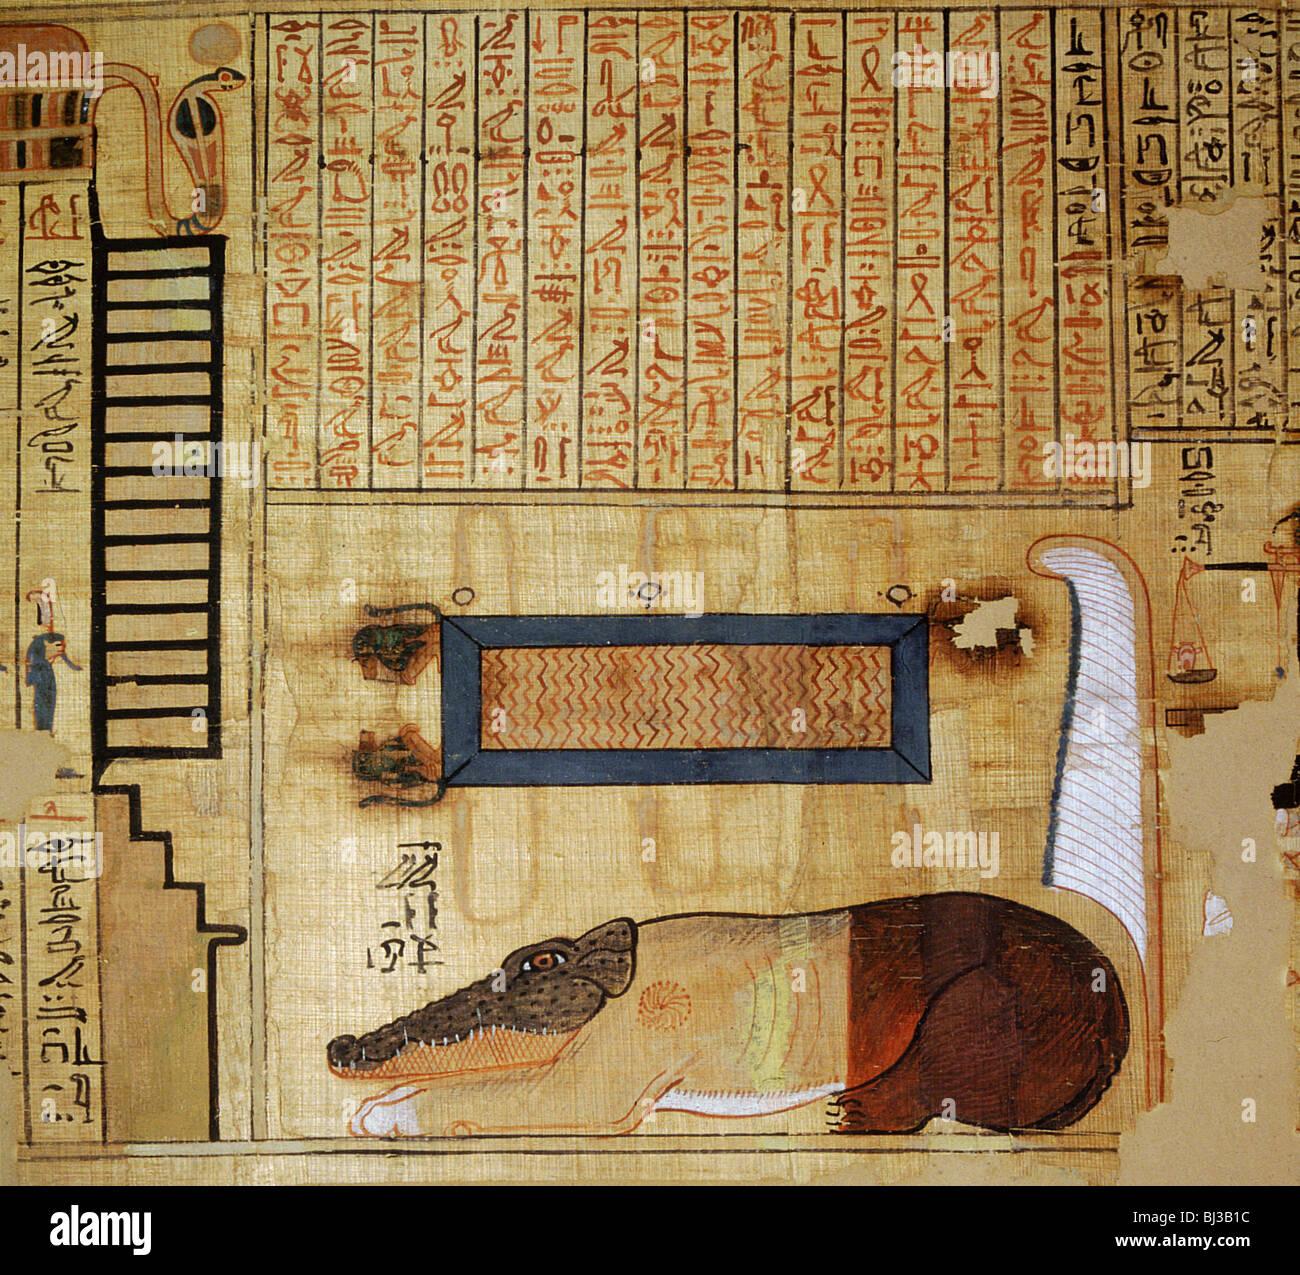 18Th Dynasty Egyptian Jewelry Essay Sample